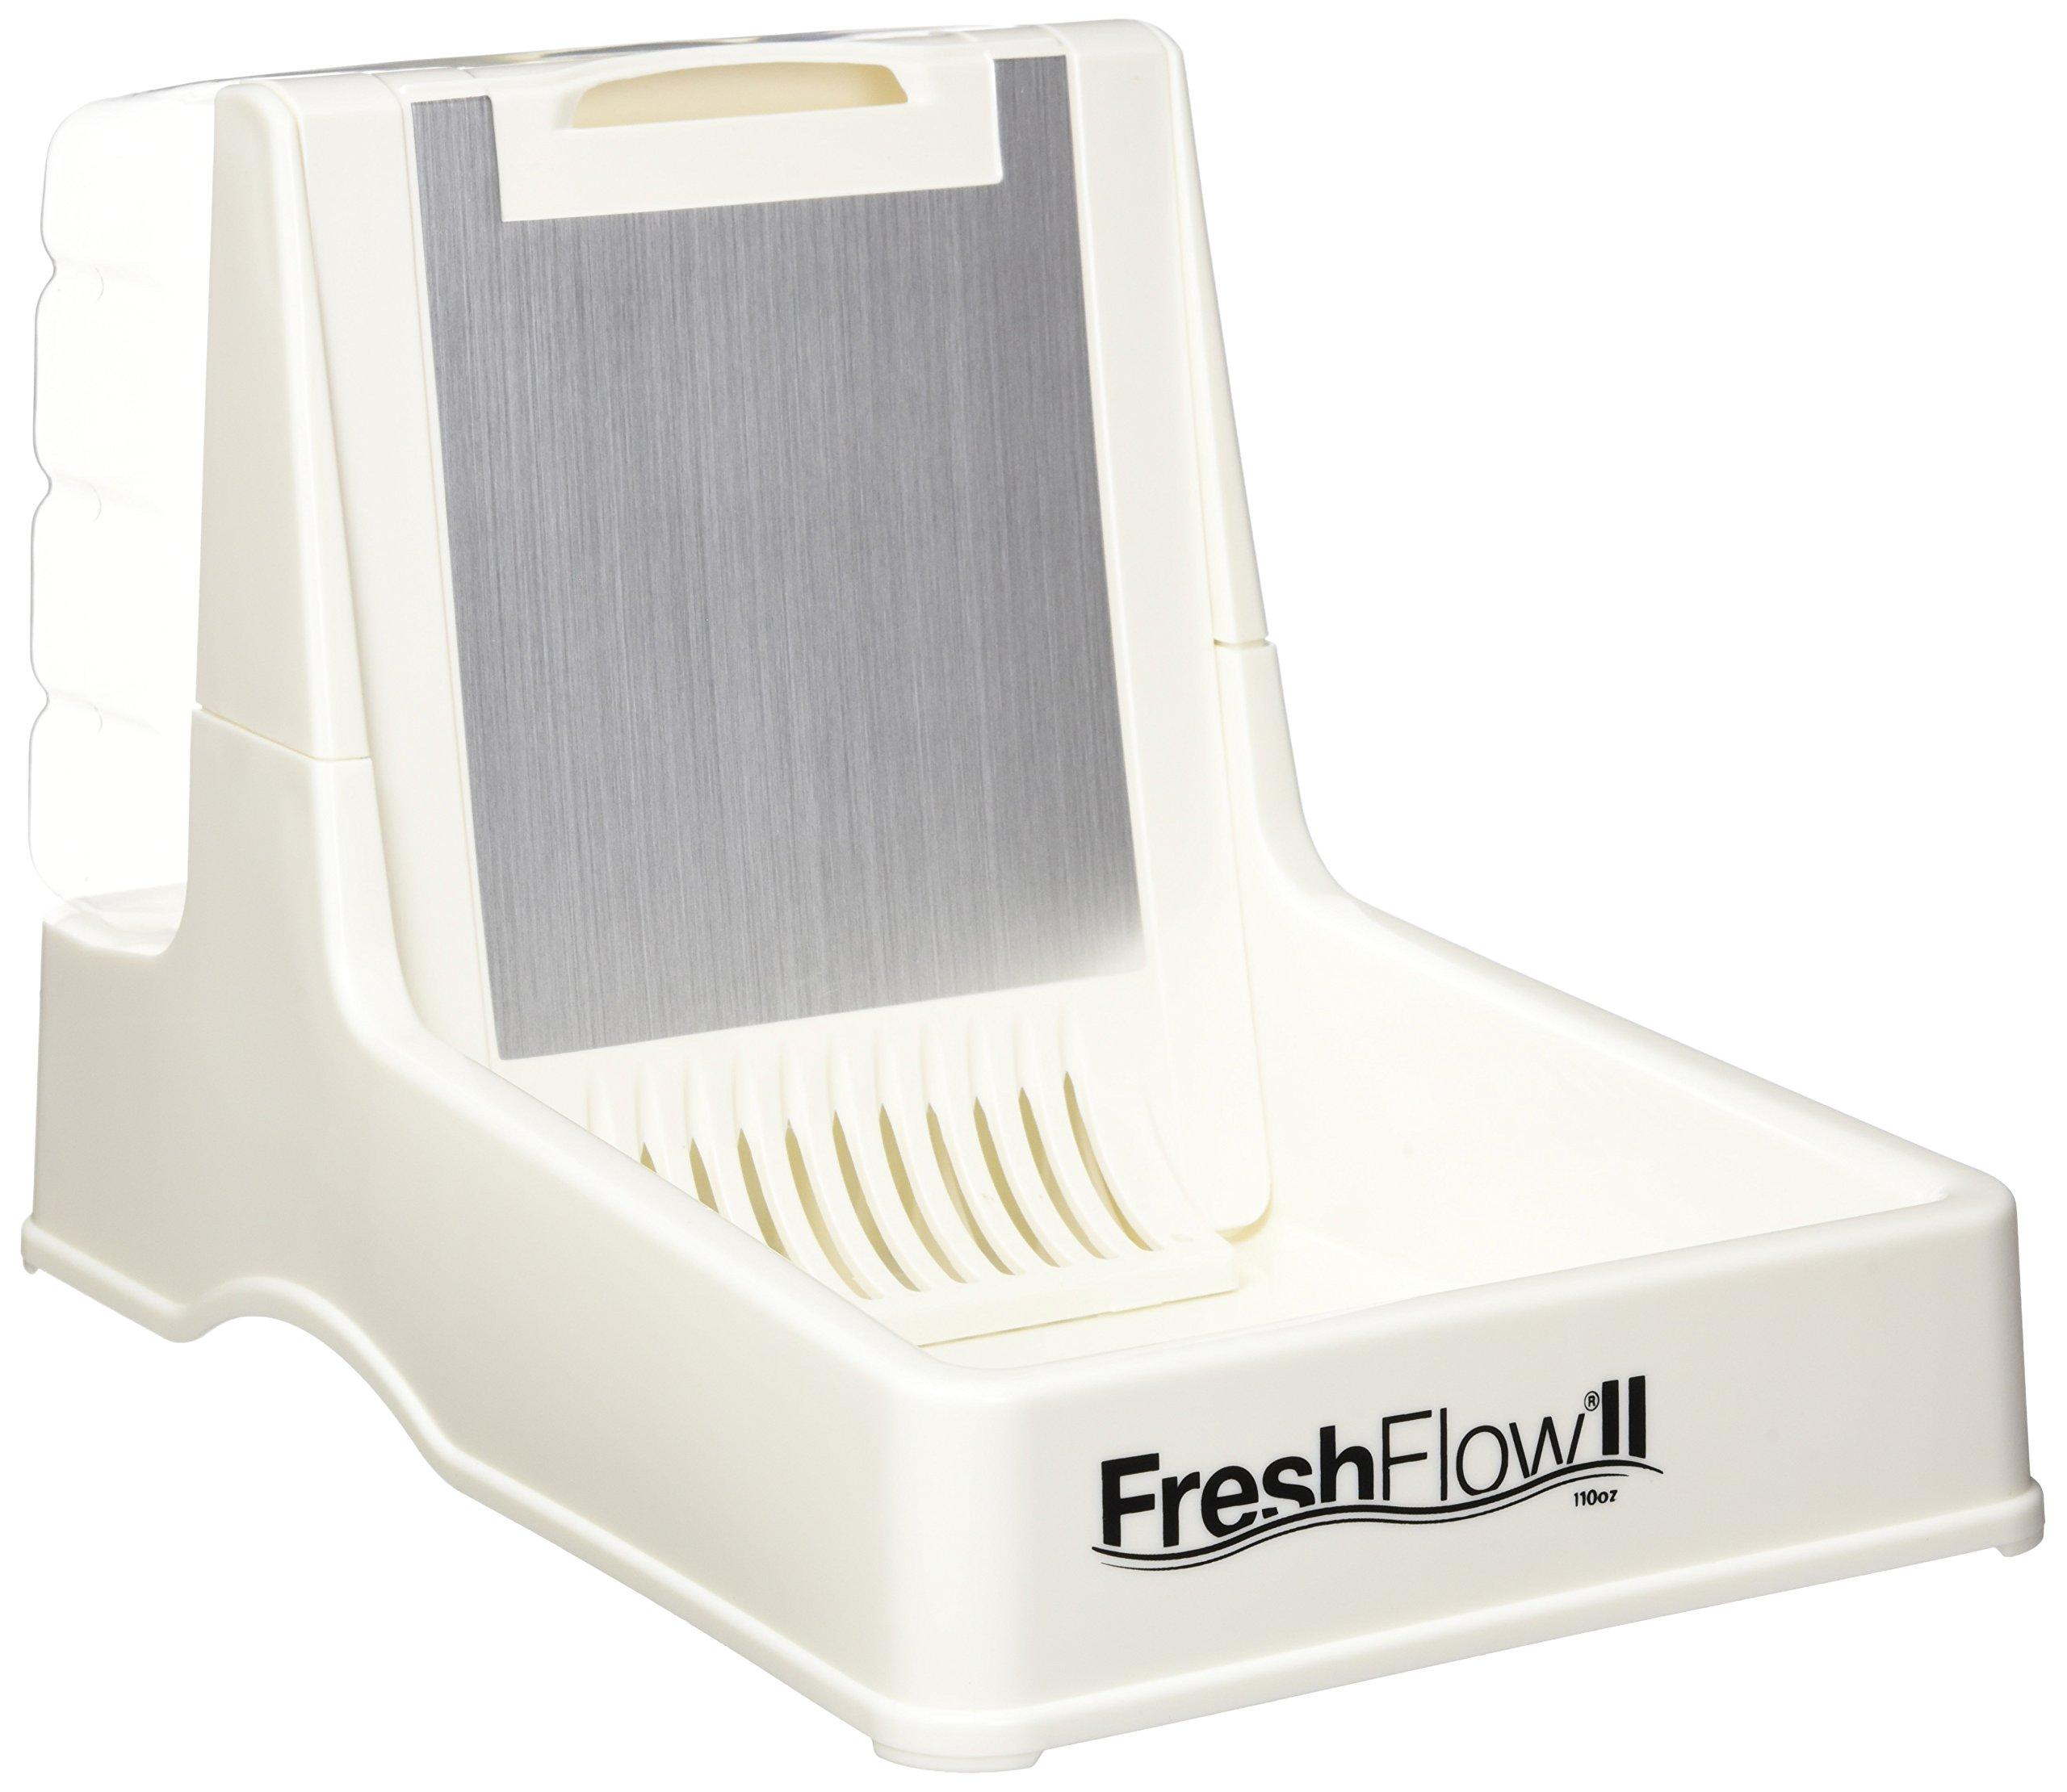 Petmate Fresh Flow II Fountain 110Oz